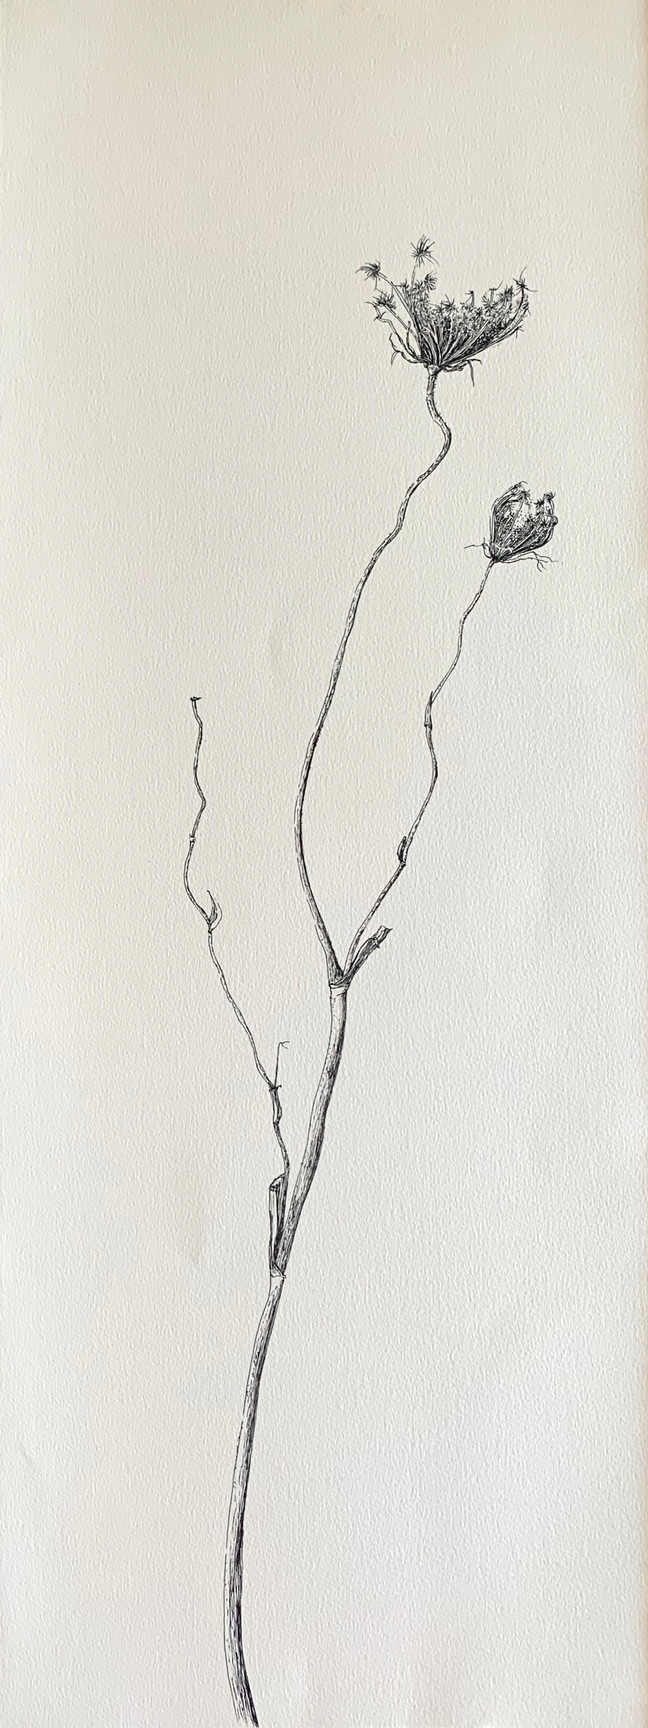 Dry Wild Carrot 7 (Pen on Arche Paper 27X75 cm)